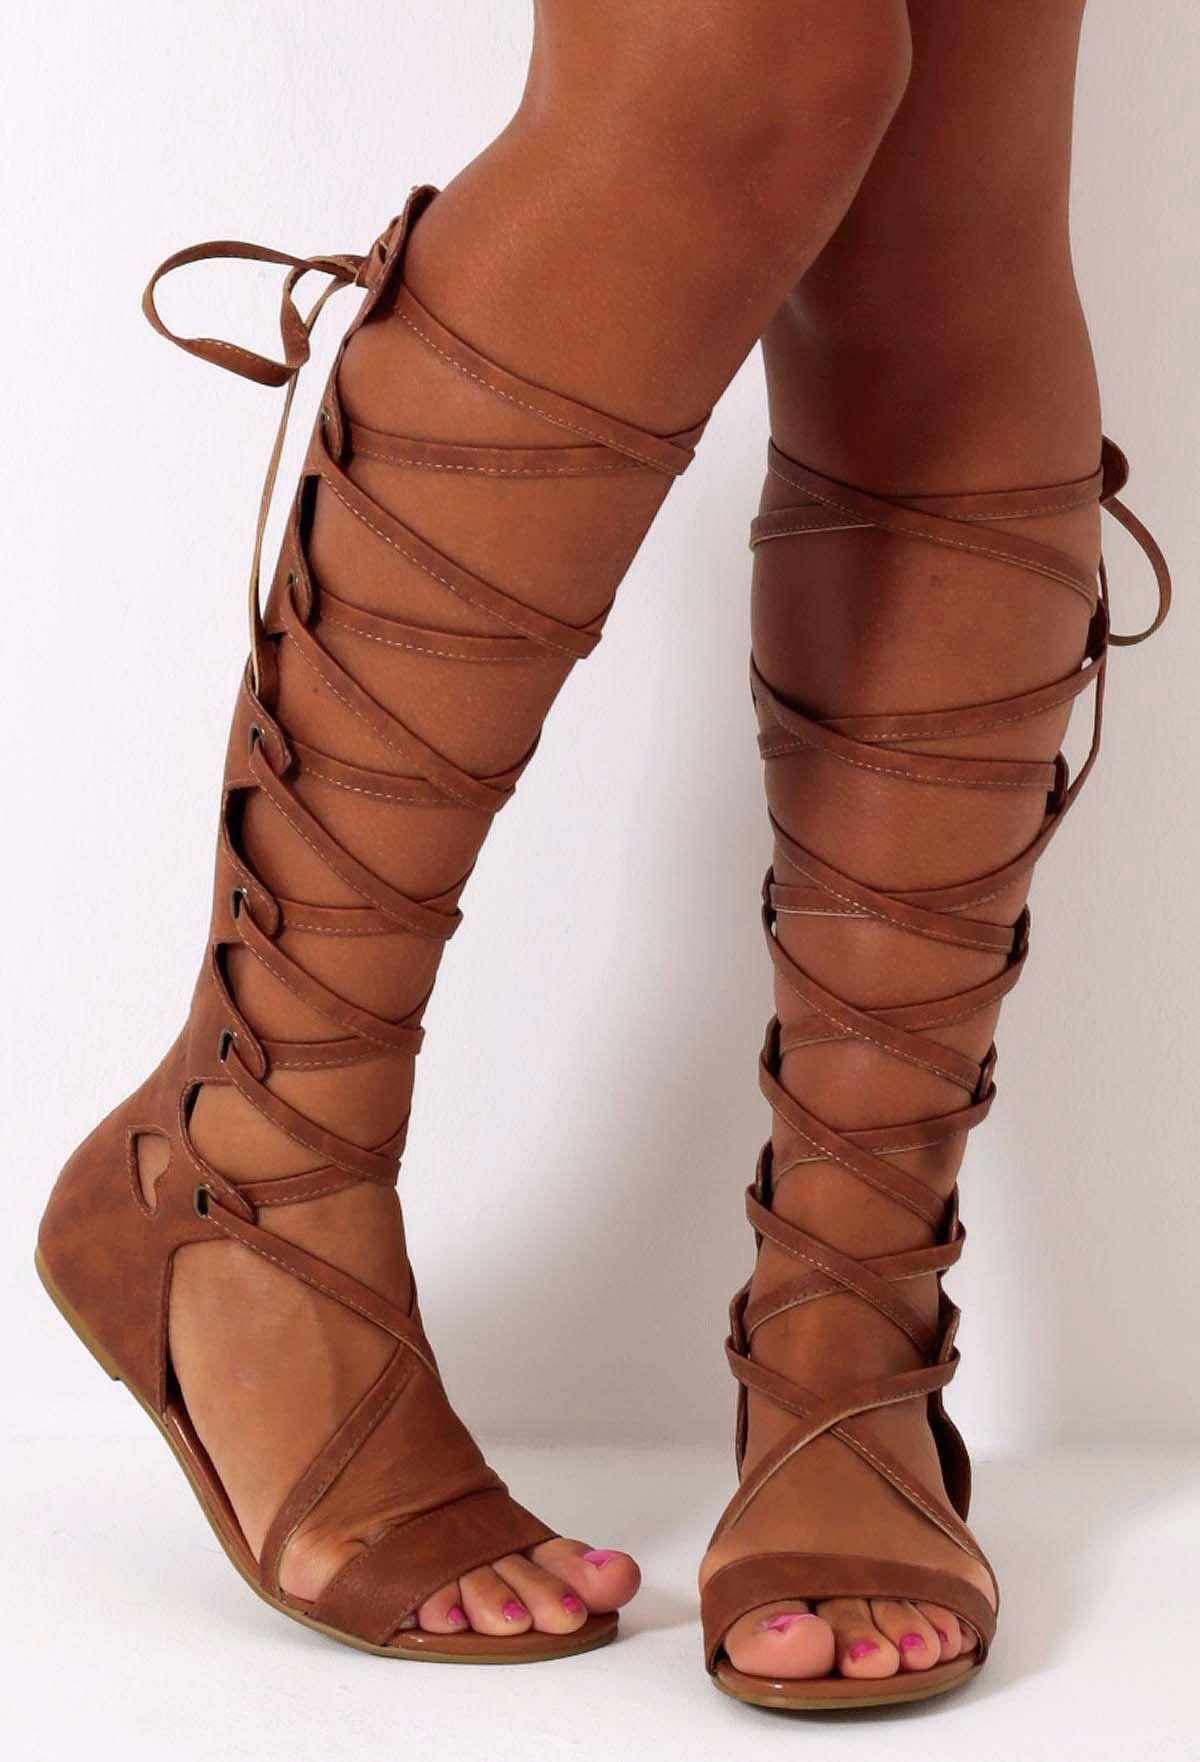 Aphrodite Tan Adjustable Gladiator Sandal Boots | Gladiators